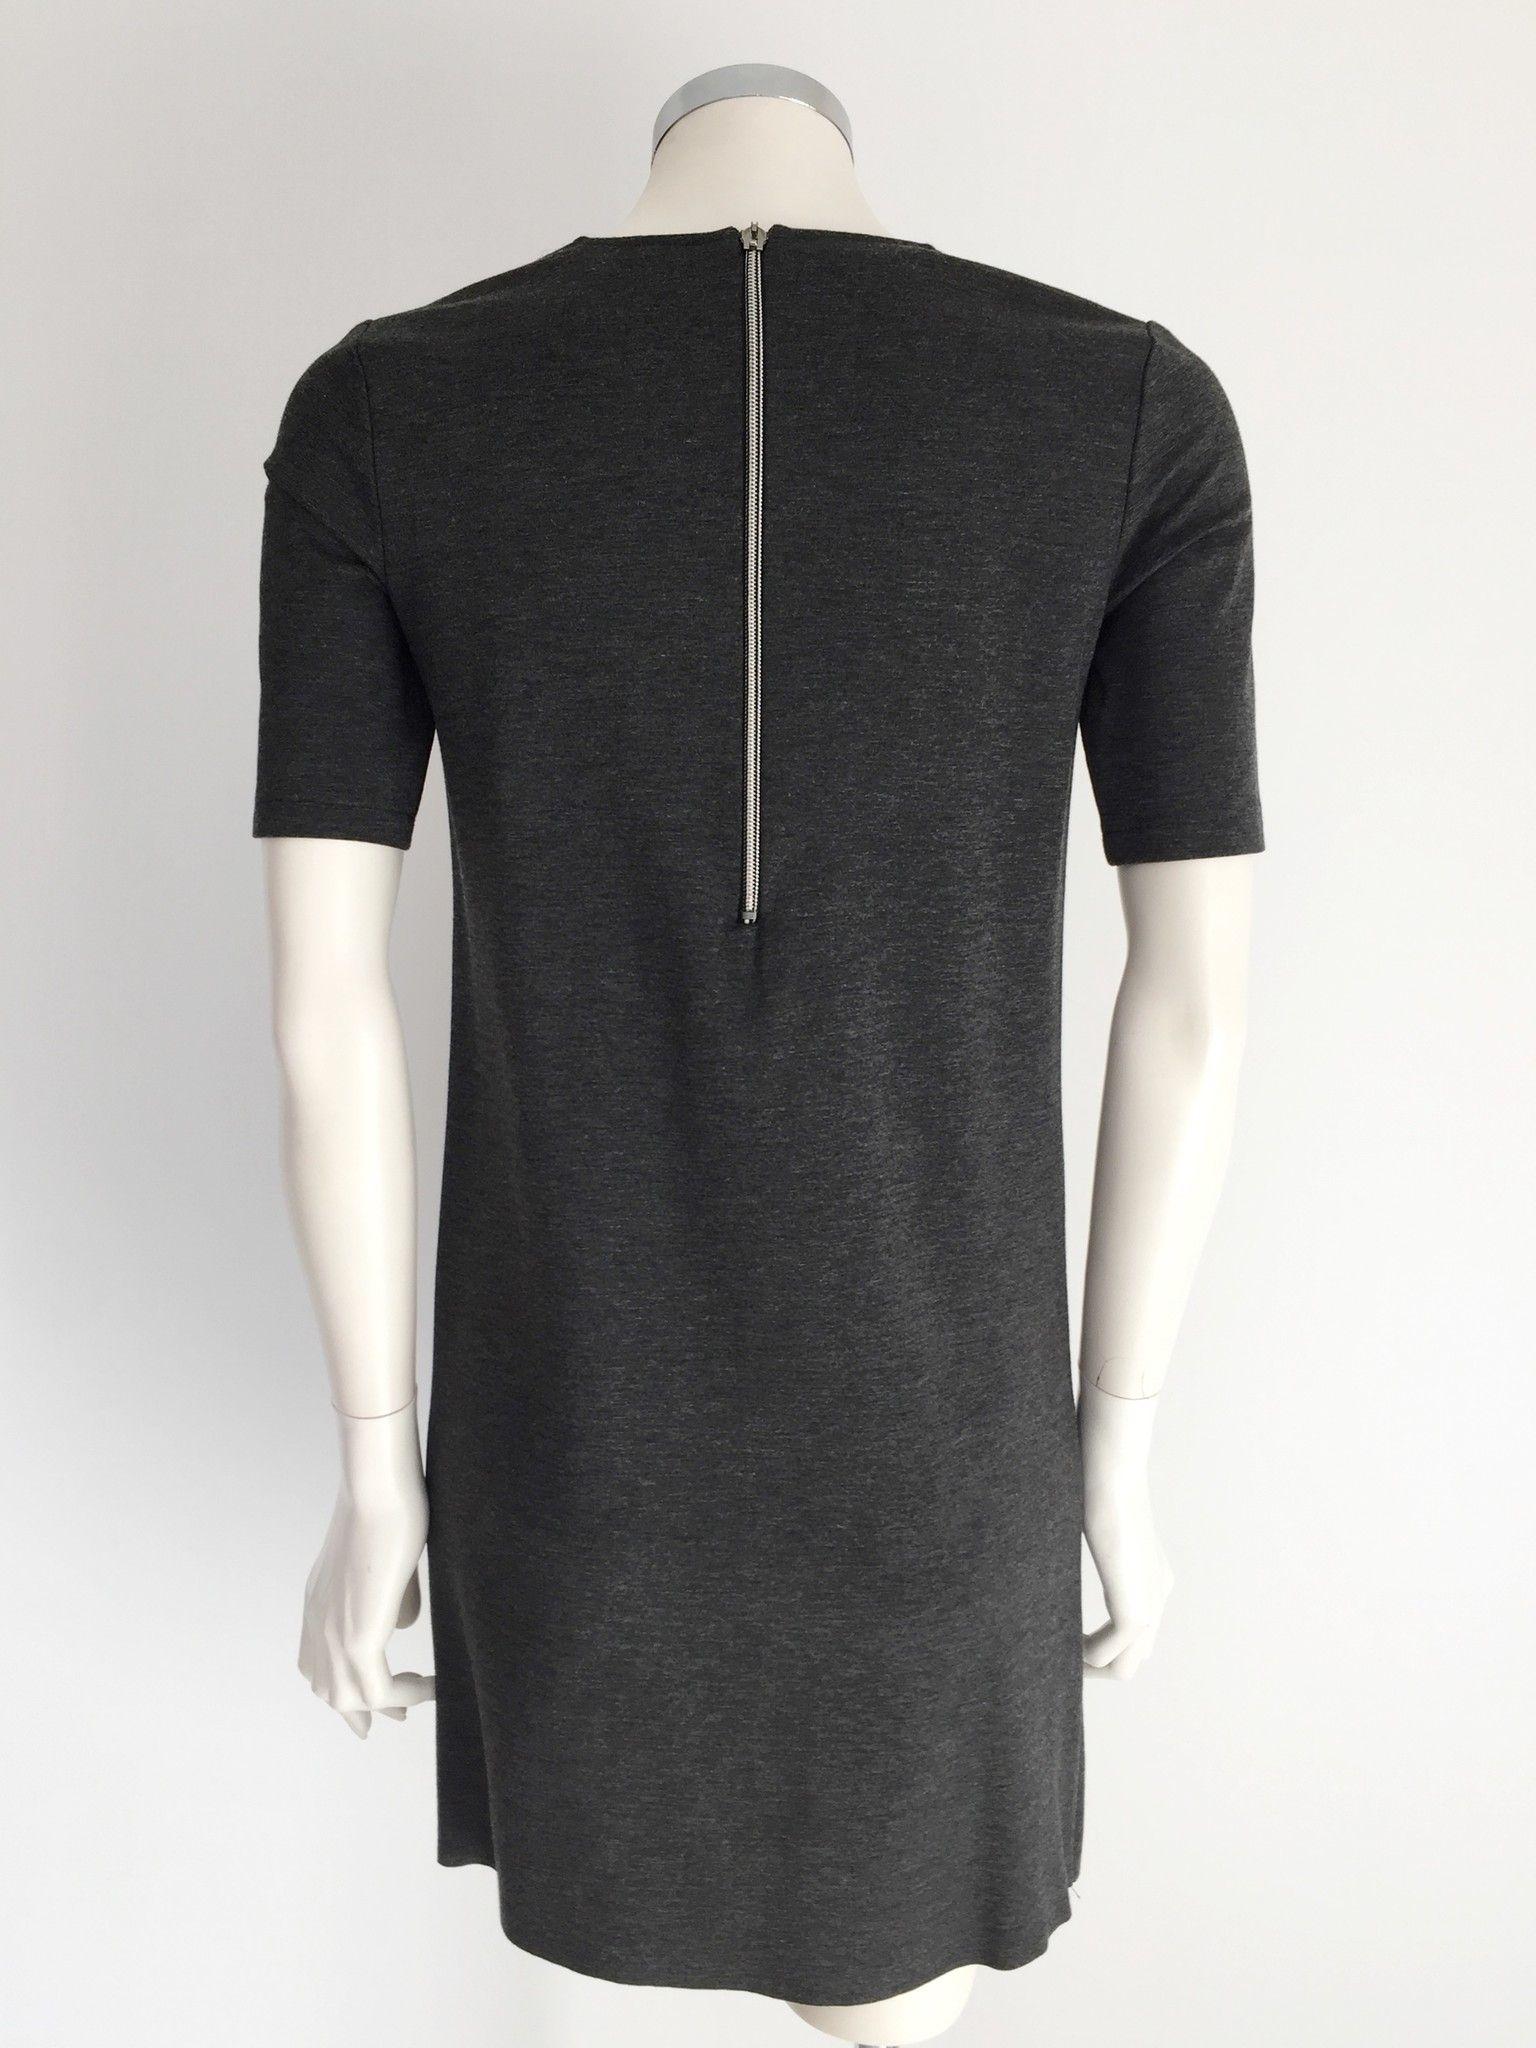 Privè Short Sleeve Dress Cod.5400